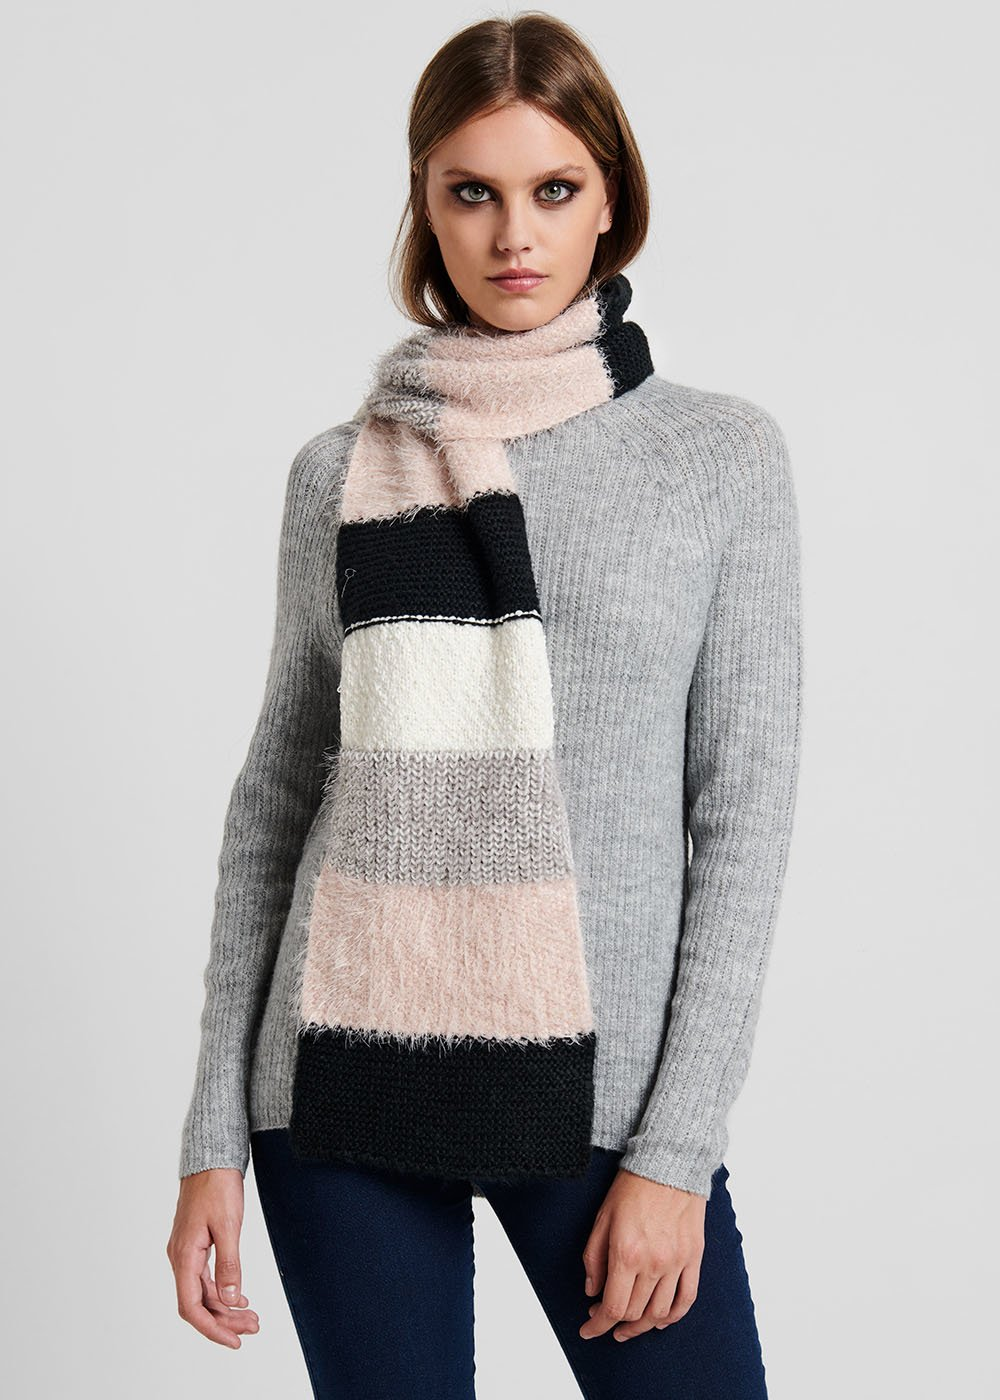 Sofy scarf with coloured stripes - Black / Sepia Stripes - Woman